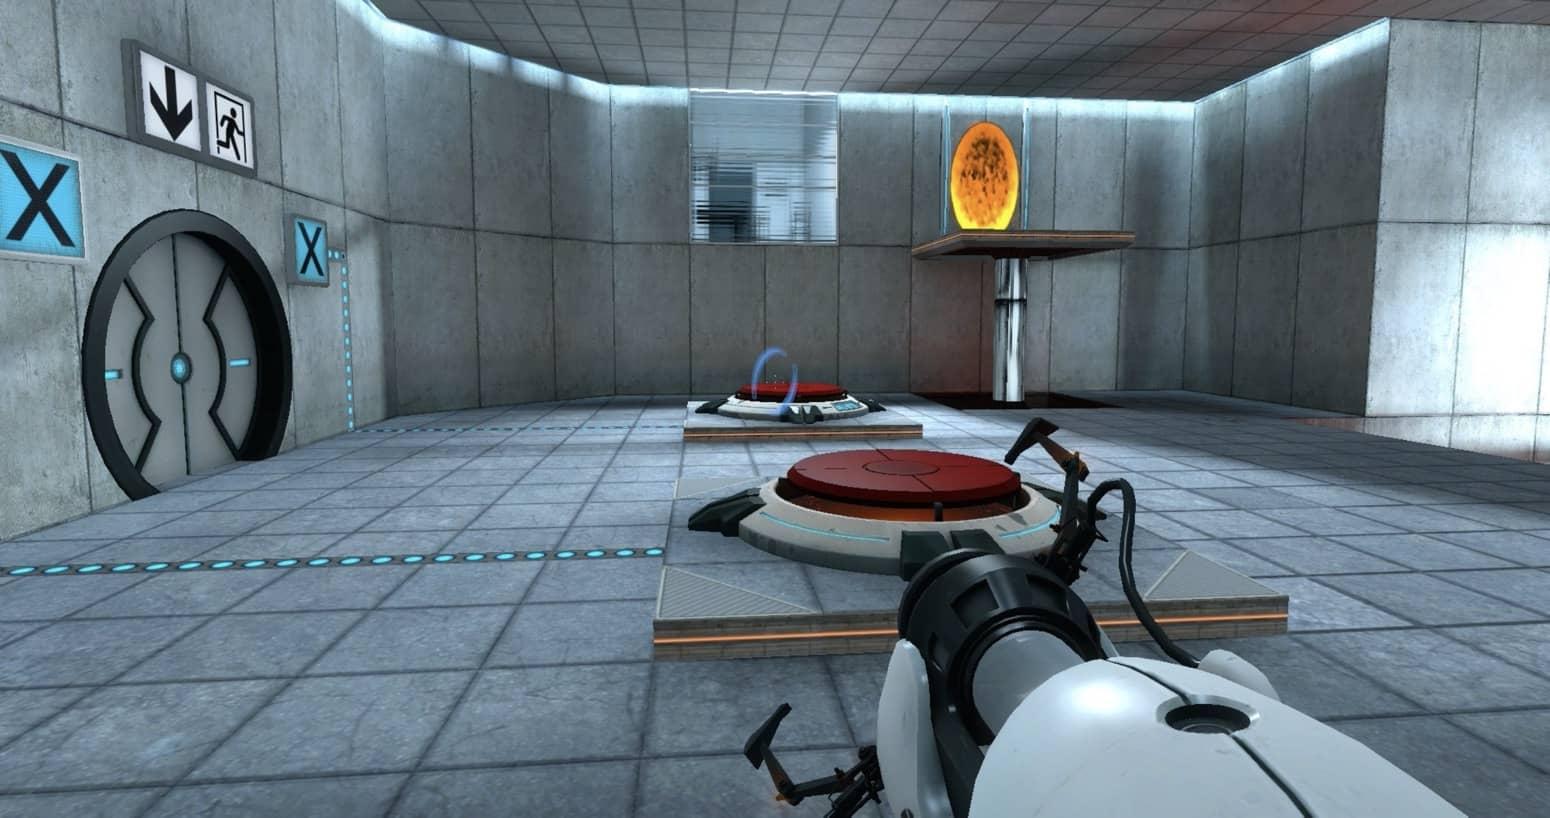 portal video game 1